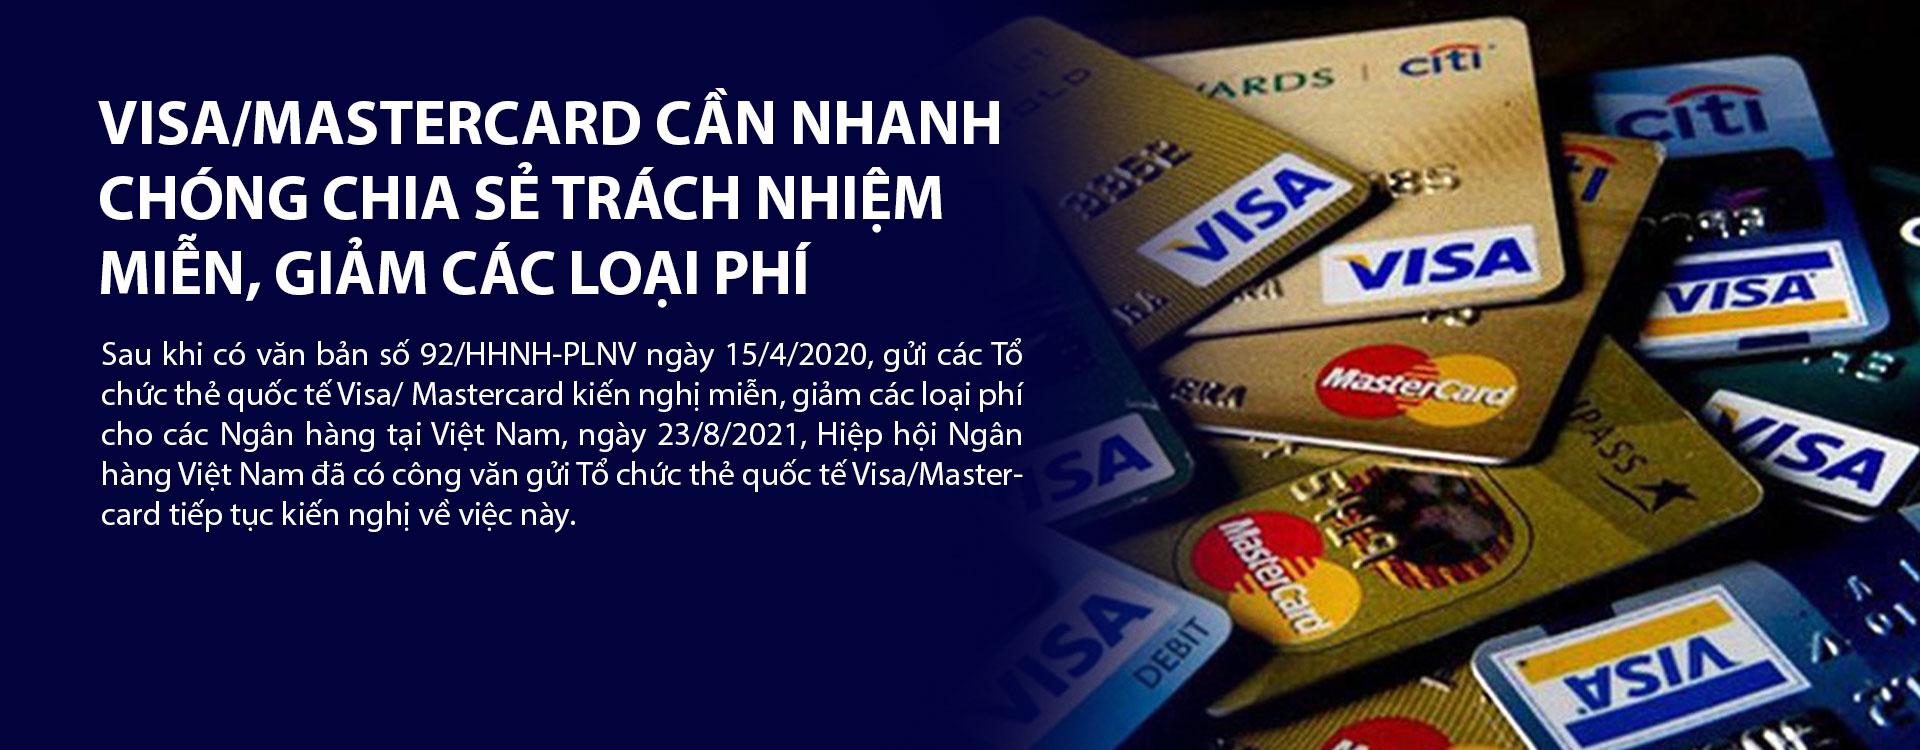 visamastercard